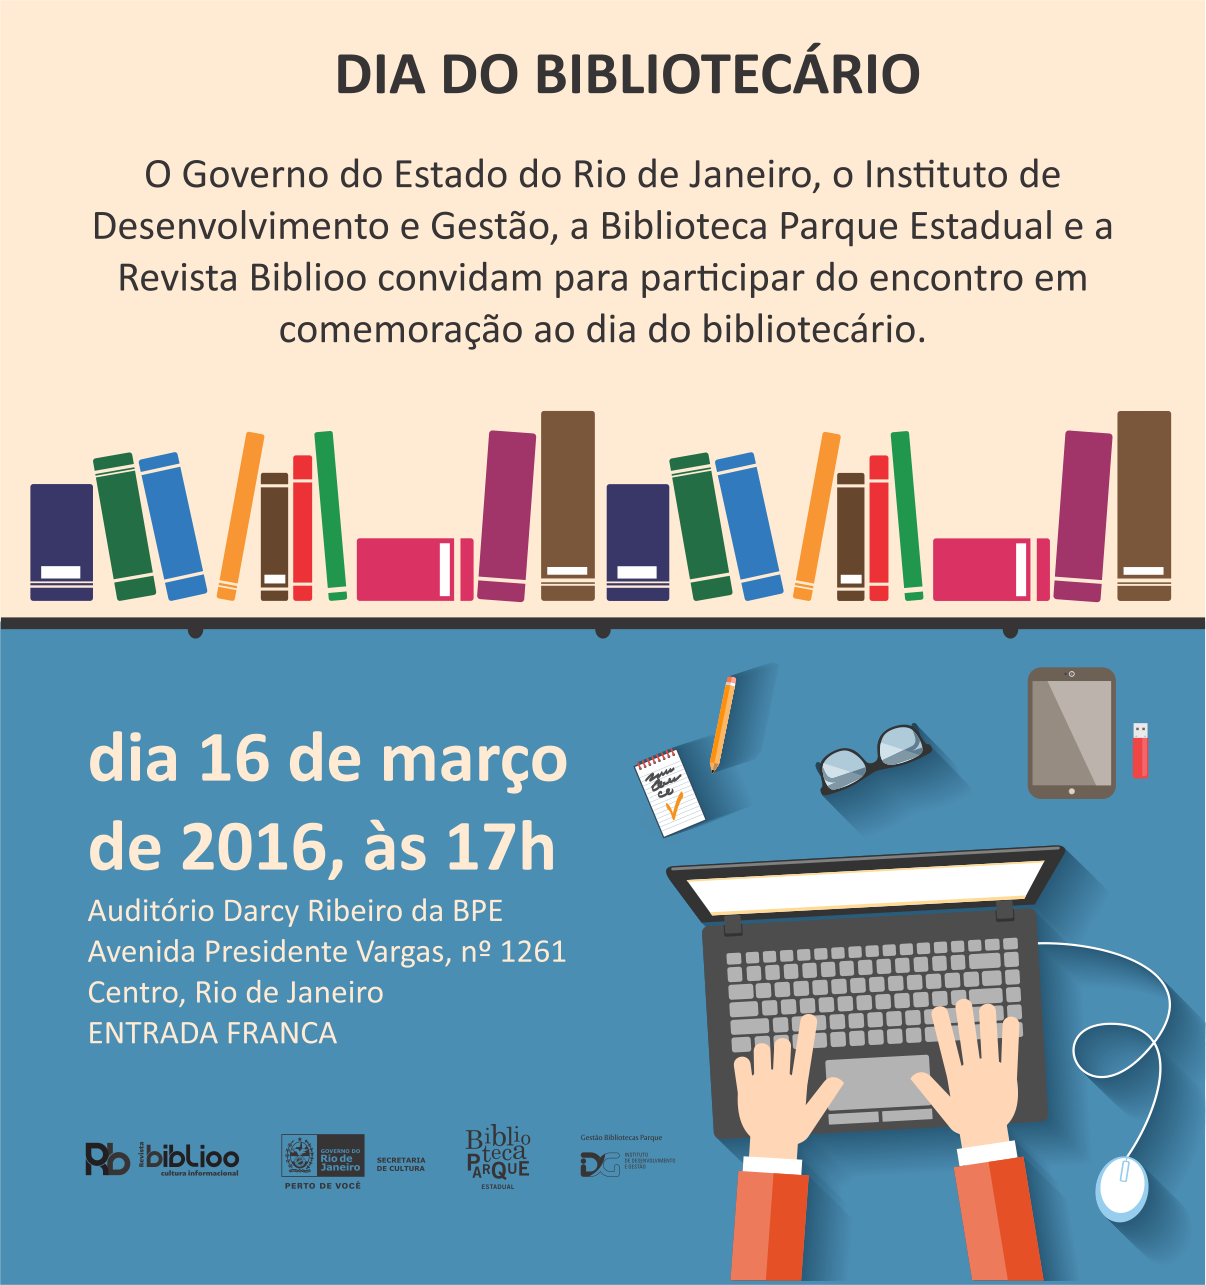 convite_diadobibliotecario1 (2)